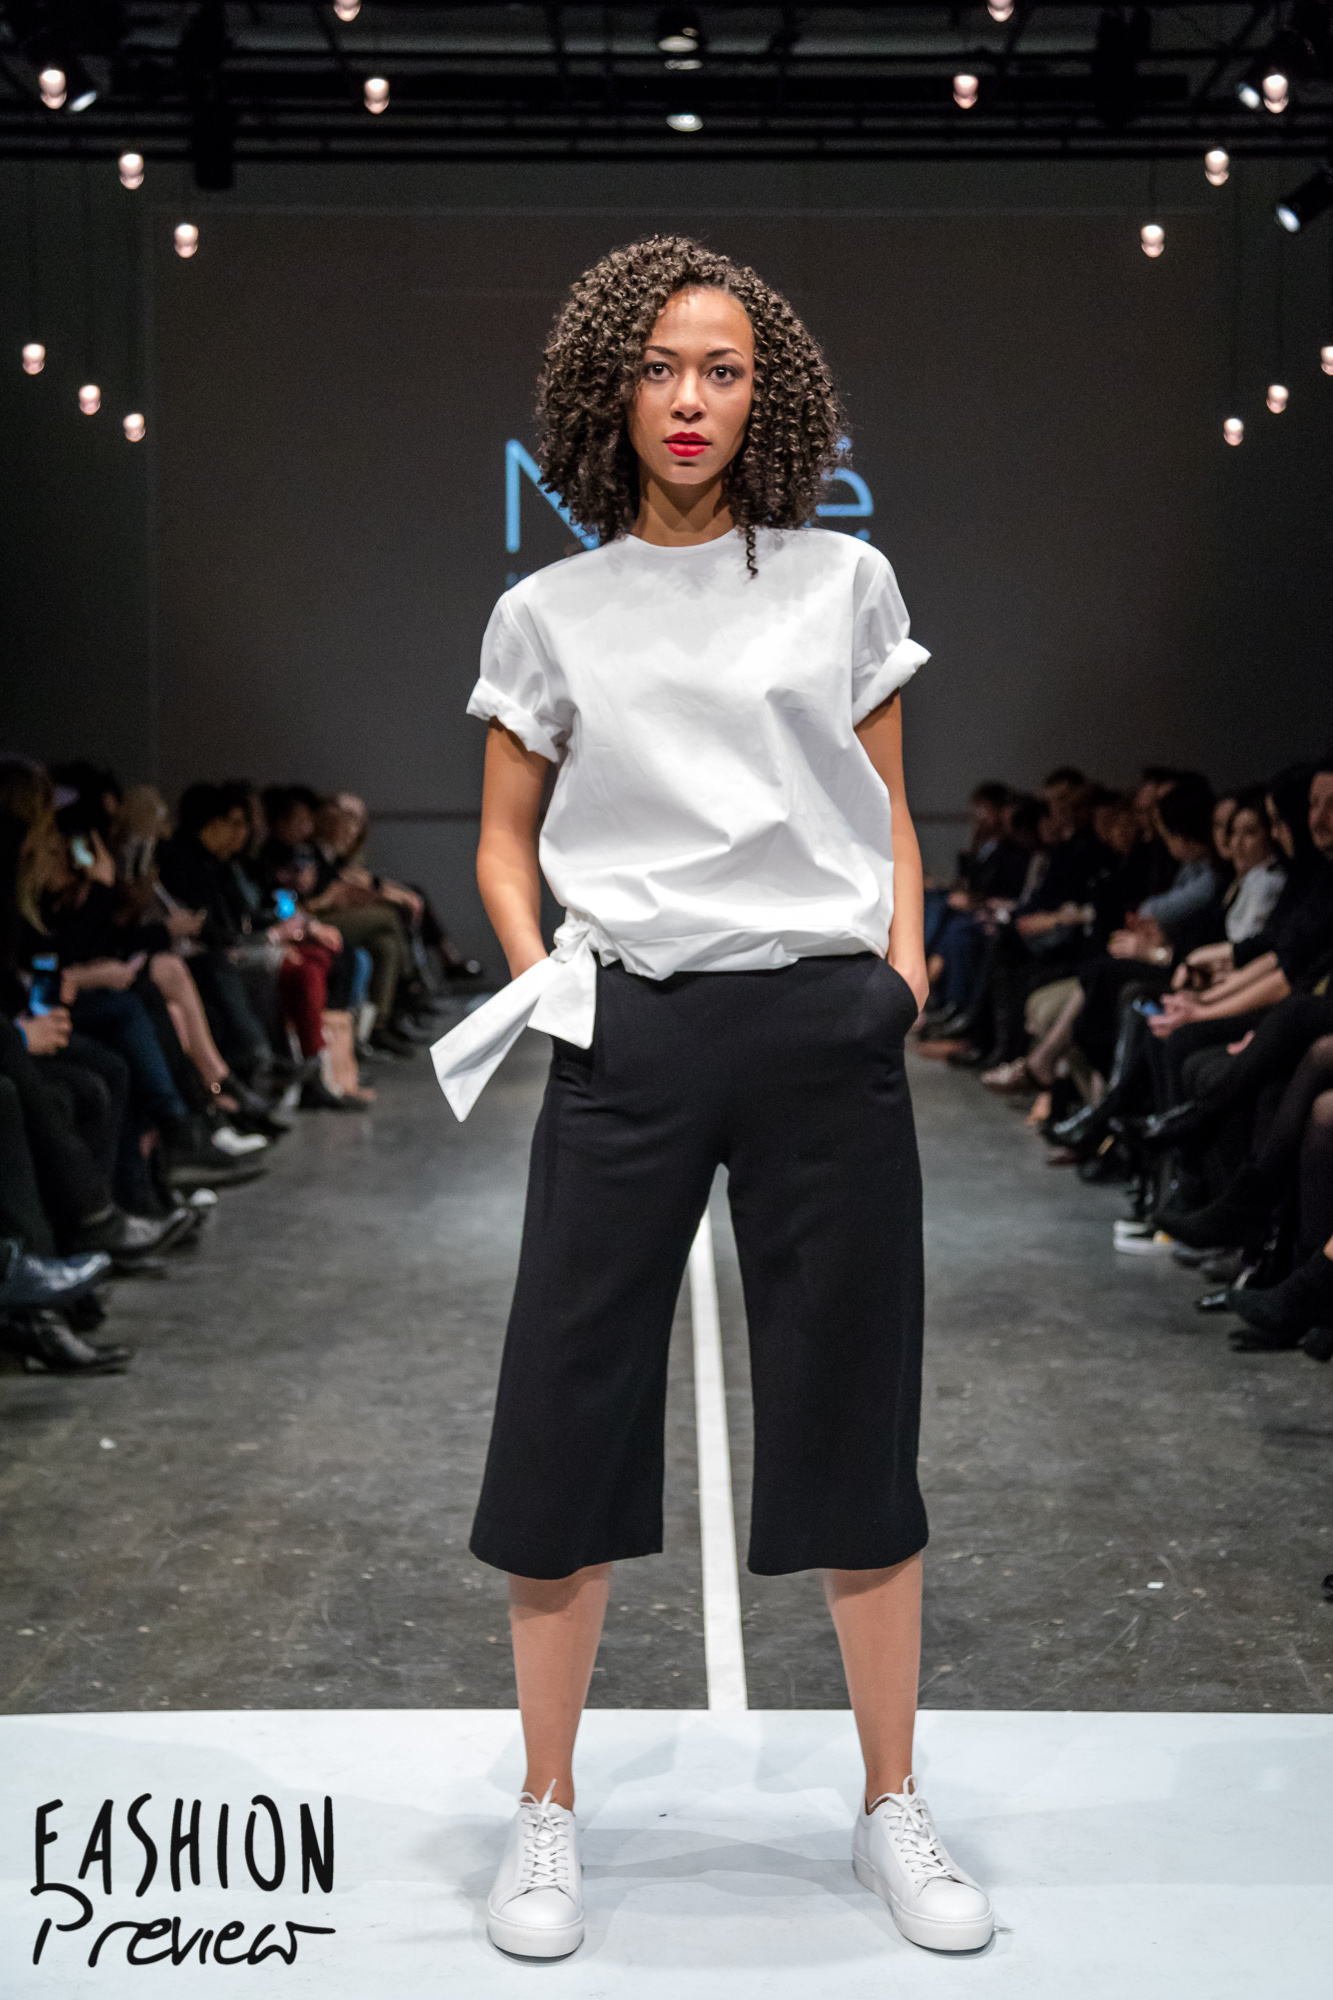 Fashion Preview 9 - Naike-02.jpg